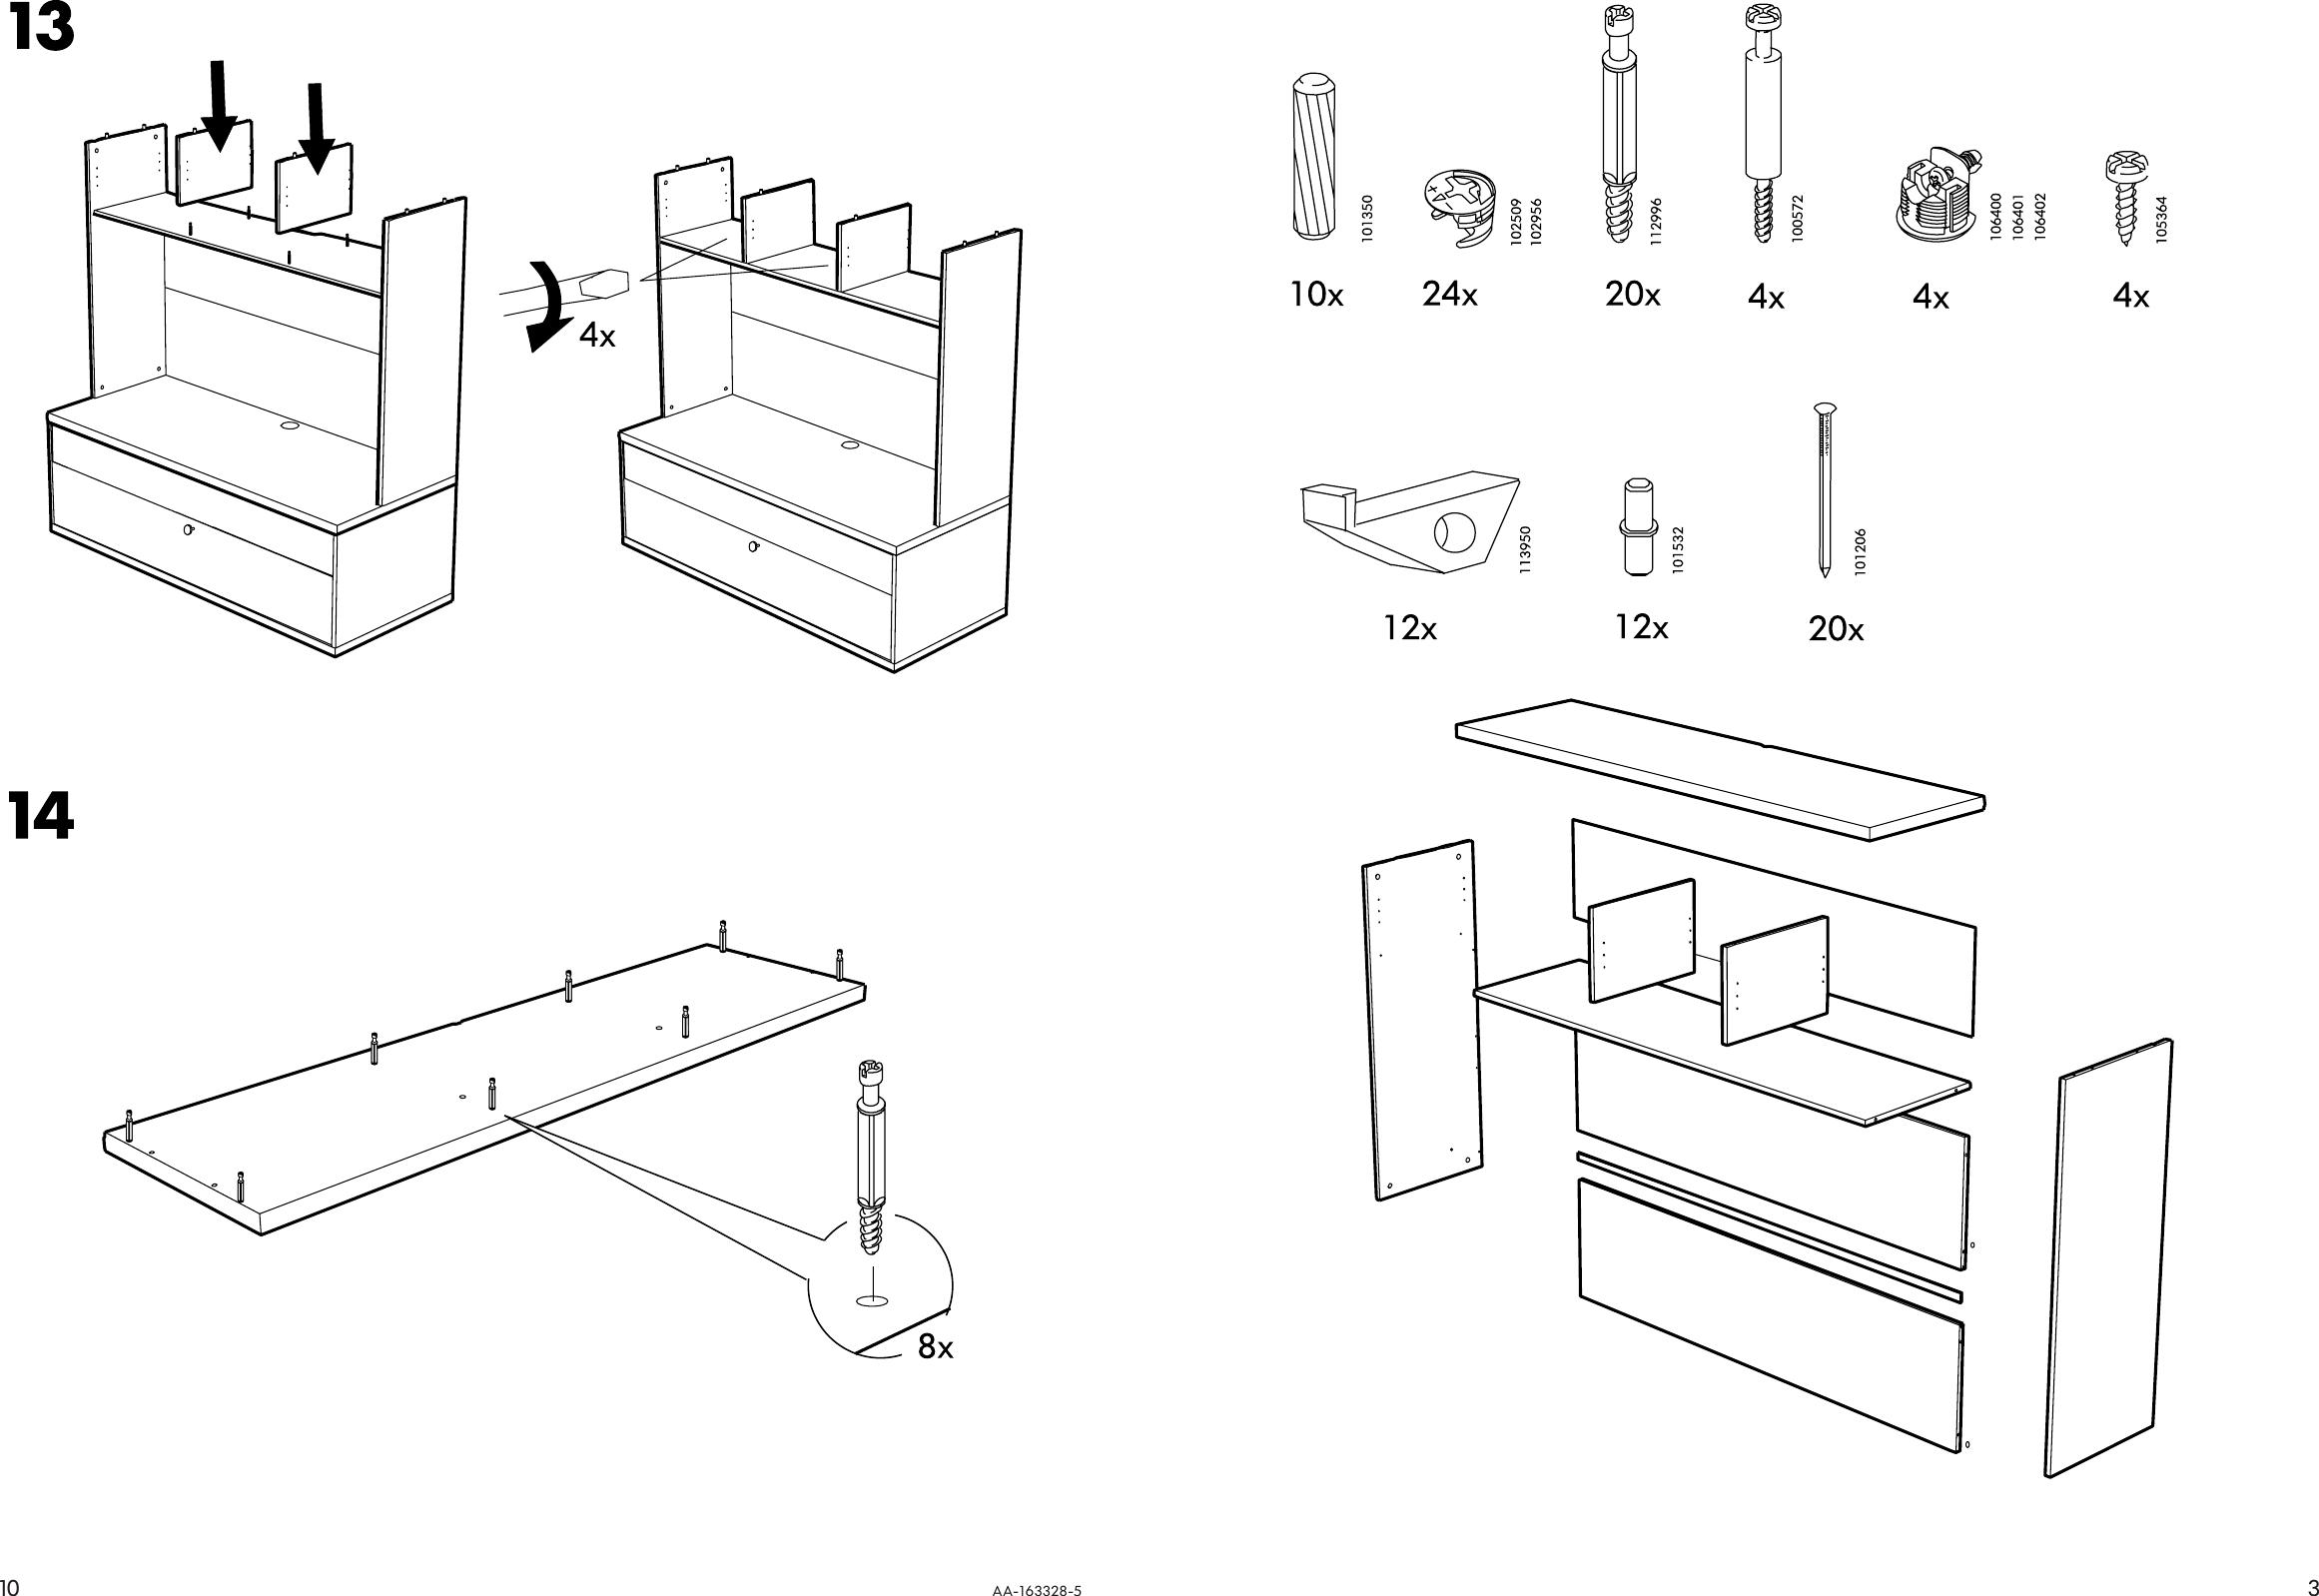 Ikea Bonde Add On For Tv Unit 57×40 Assembly Instruction 3 # Meuble Tele Bonde Ikea